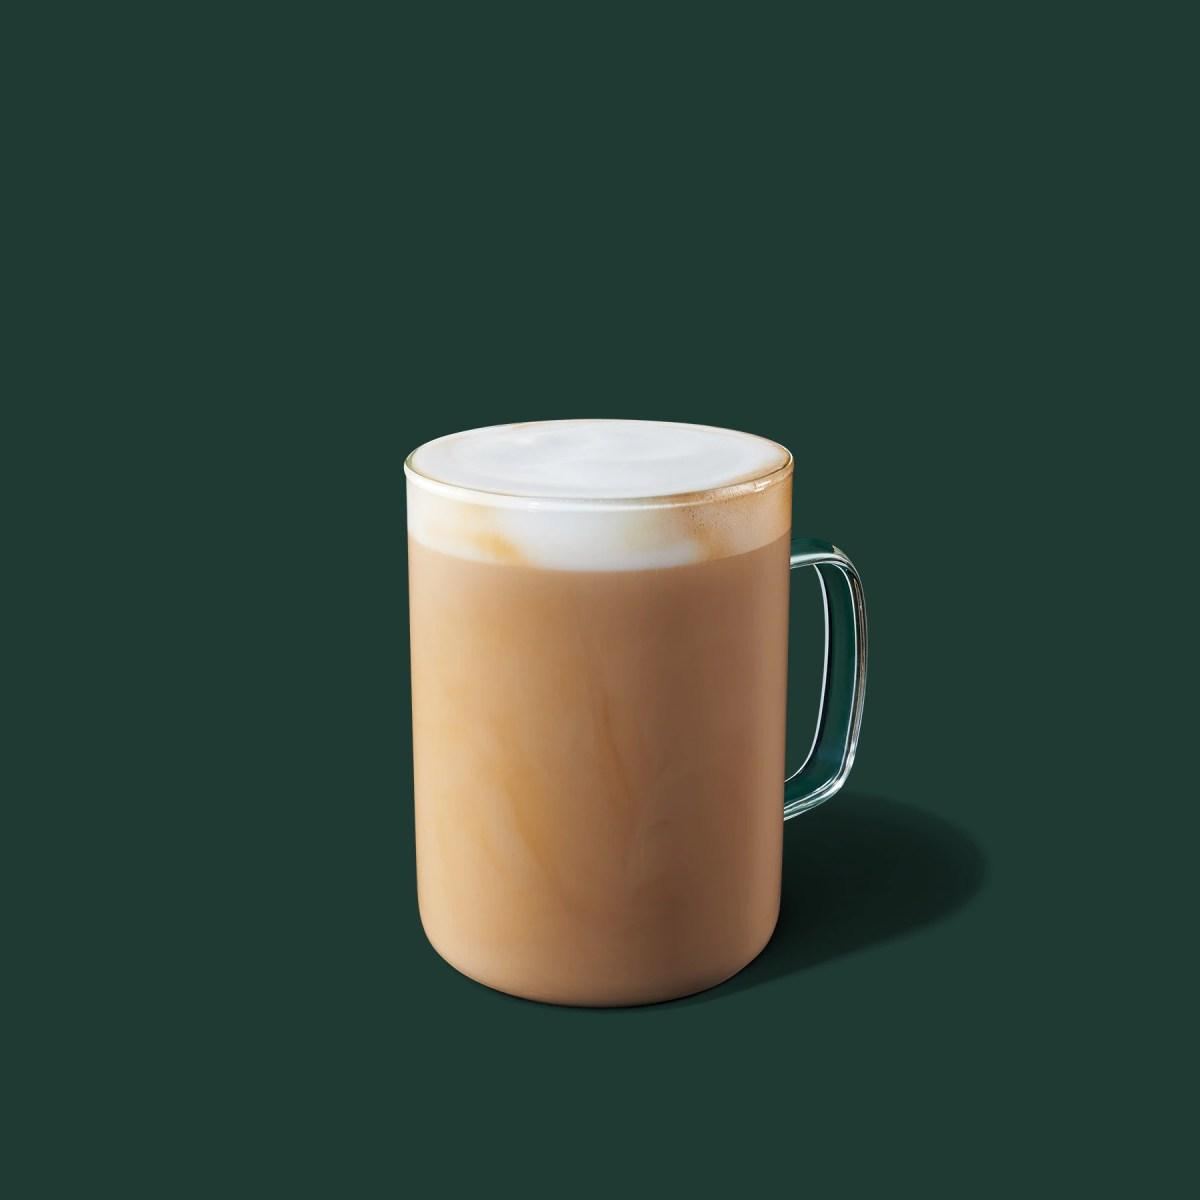 Starbucks Blonde® Vanilla Latte: Starbucks Coffee Company